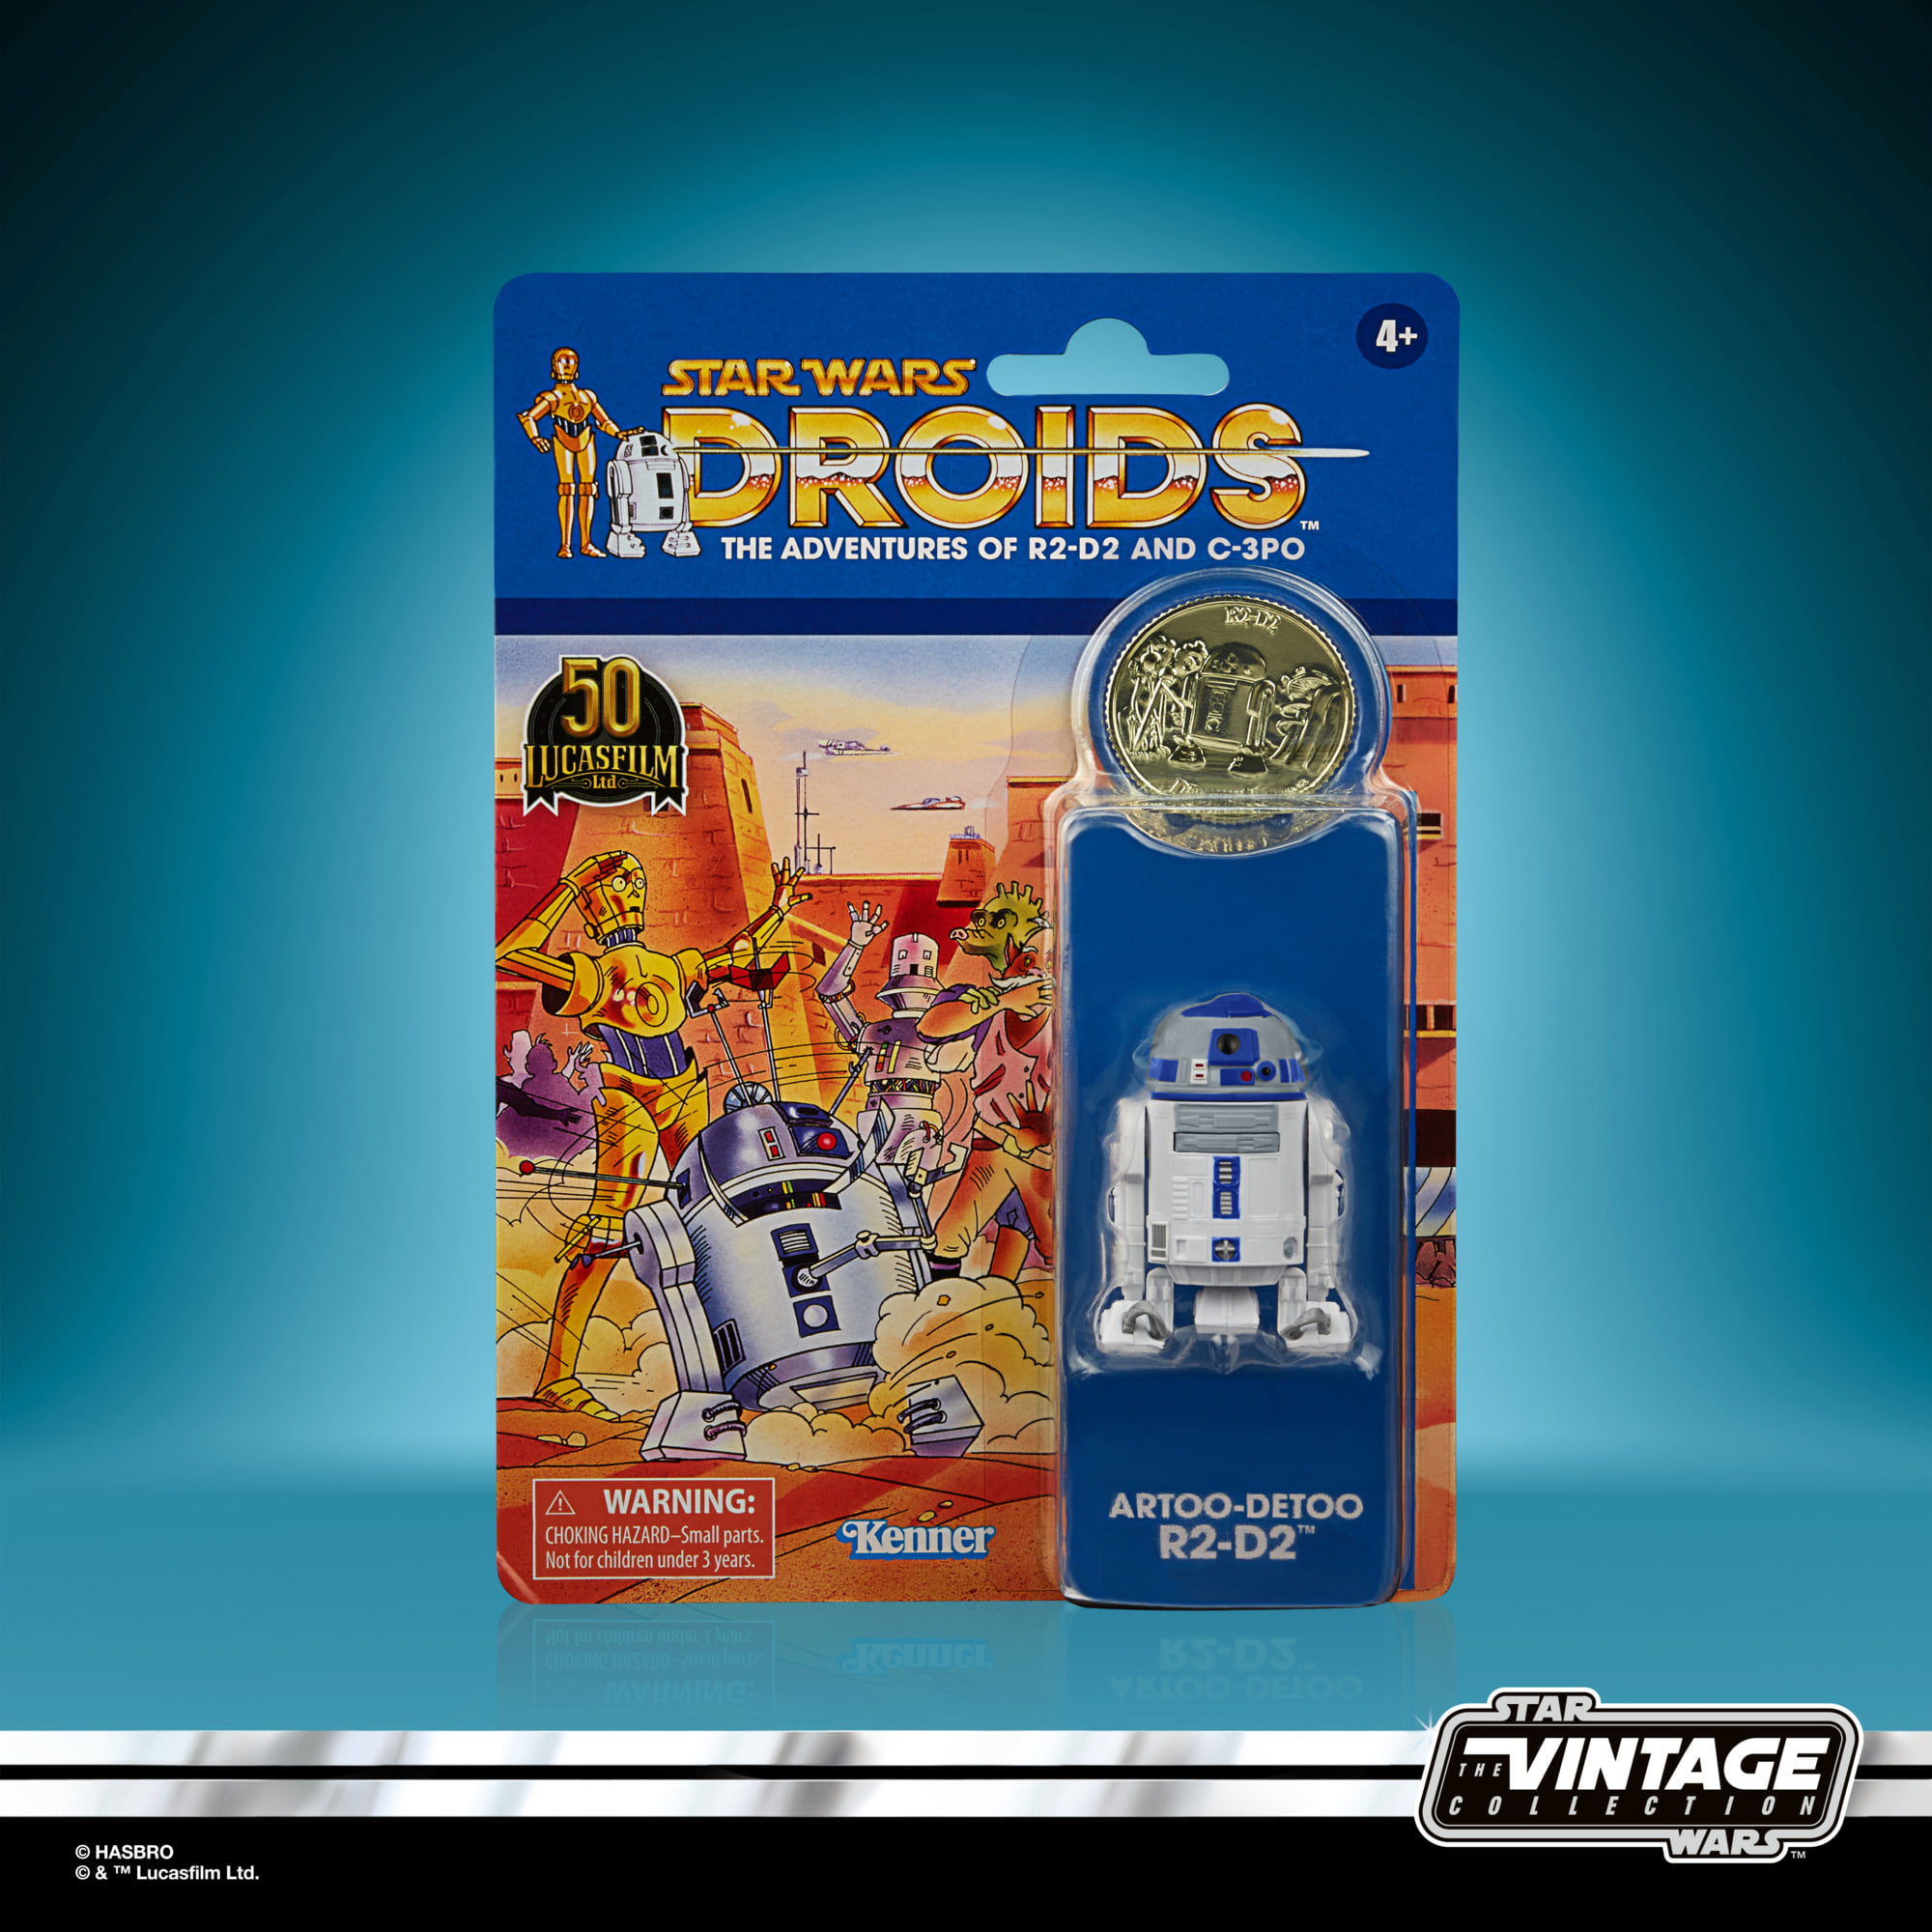 VC-R2-D2-Droids-Lucasfilm-50th-Anniversary-Carded-1.jpg